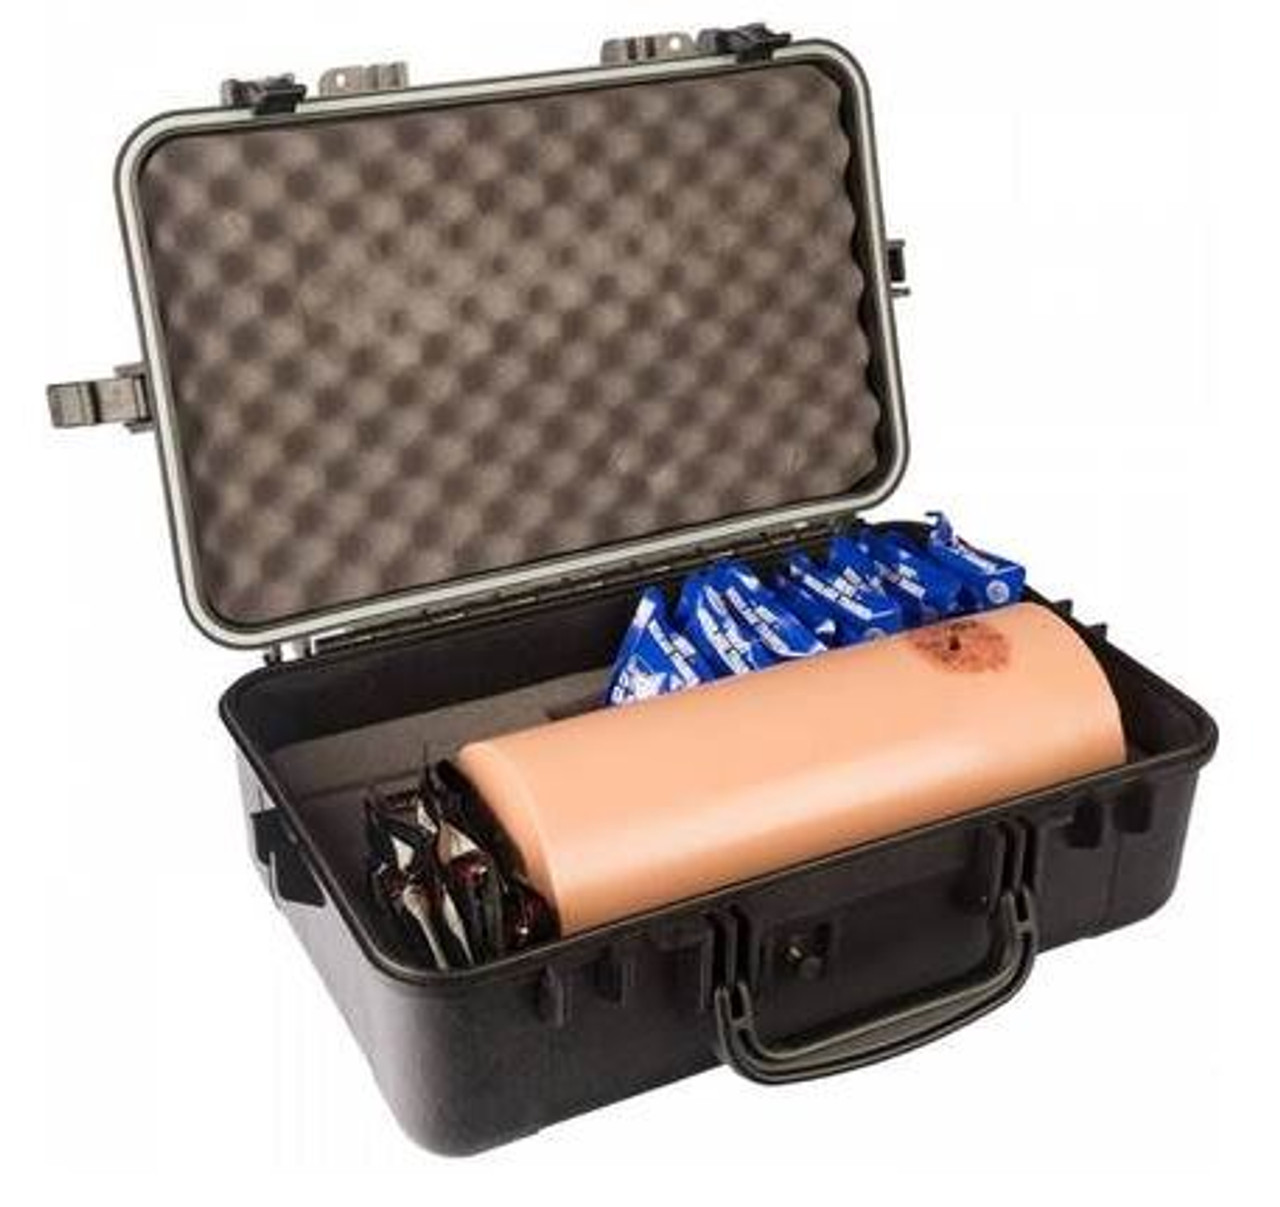 Z Medica Hemorrhage Control Training Kit With Quikclot